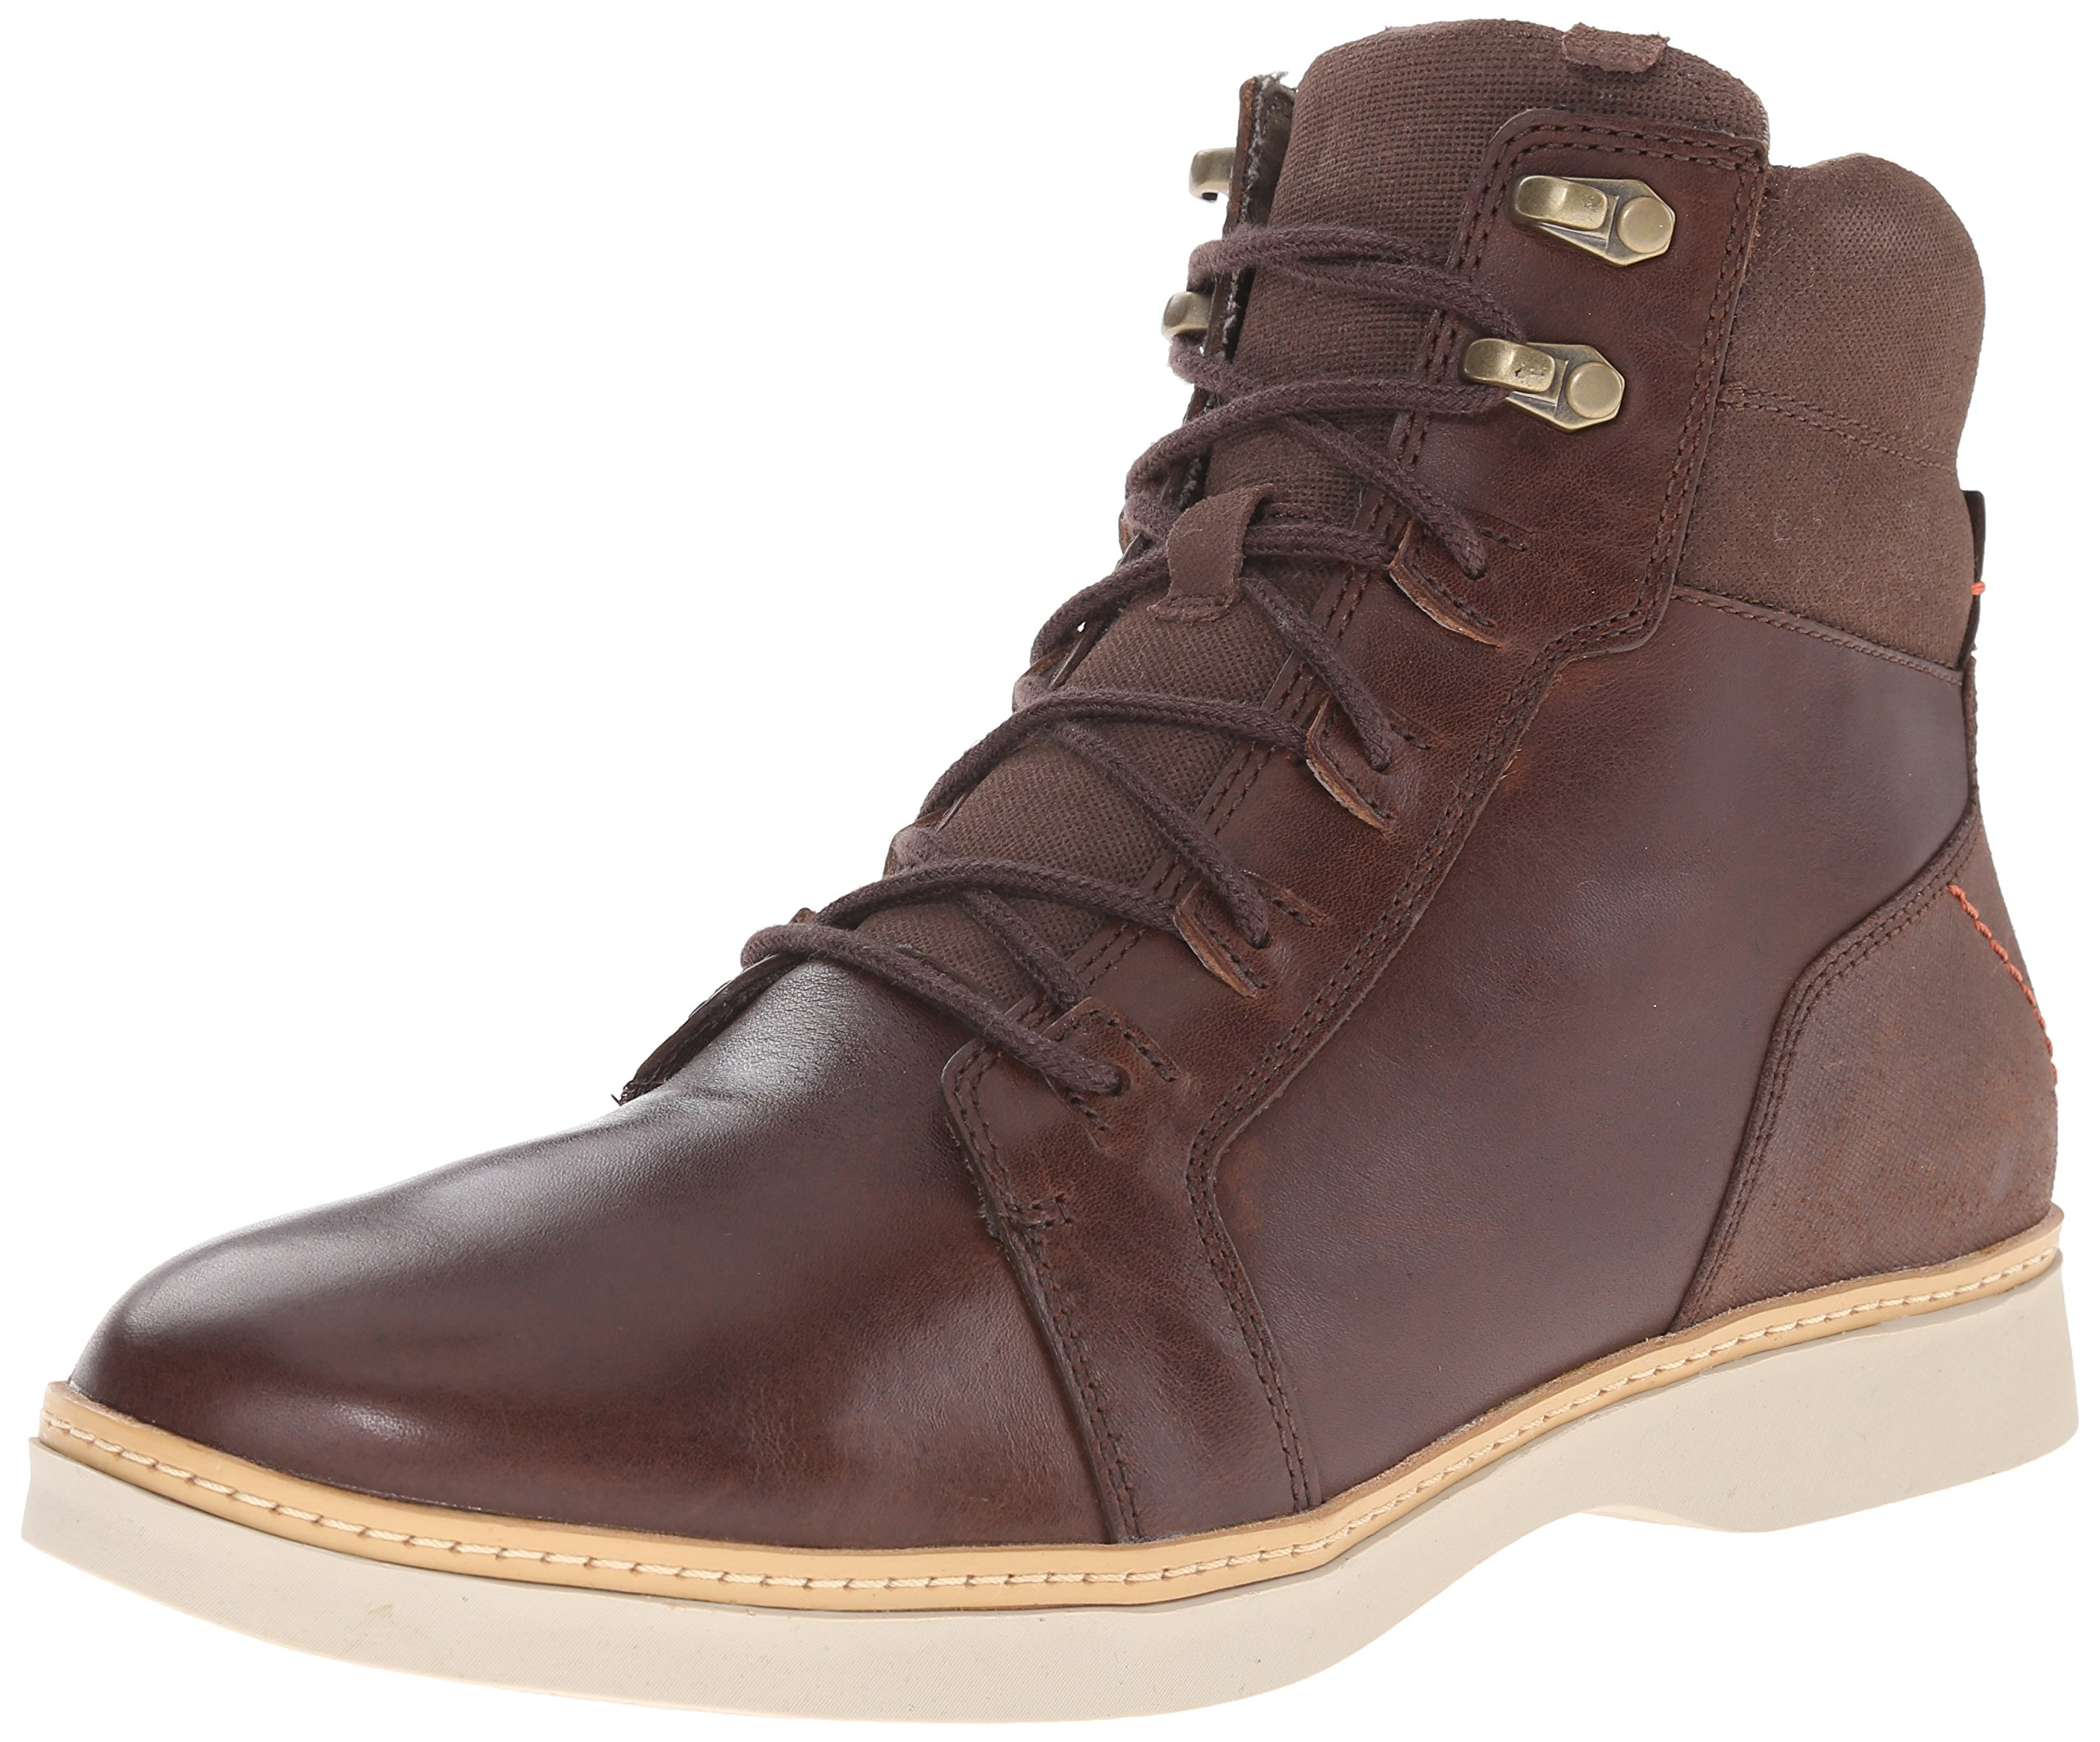 Ahnu Men's Roanoke Dressy 6 Eye Boot, Corduroy, 9.5 M US